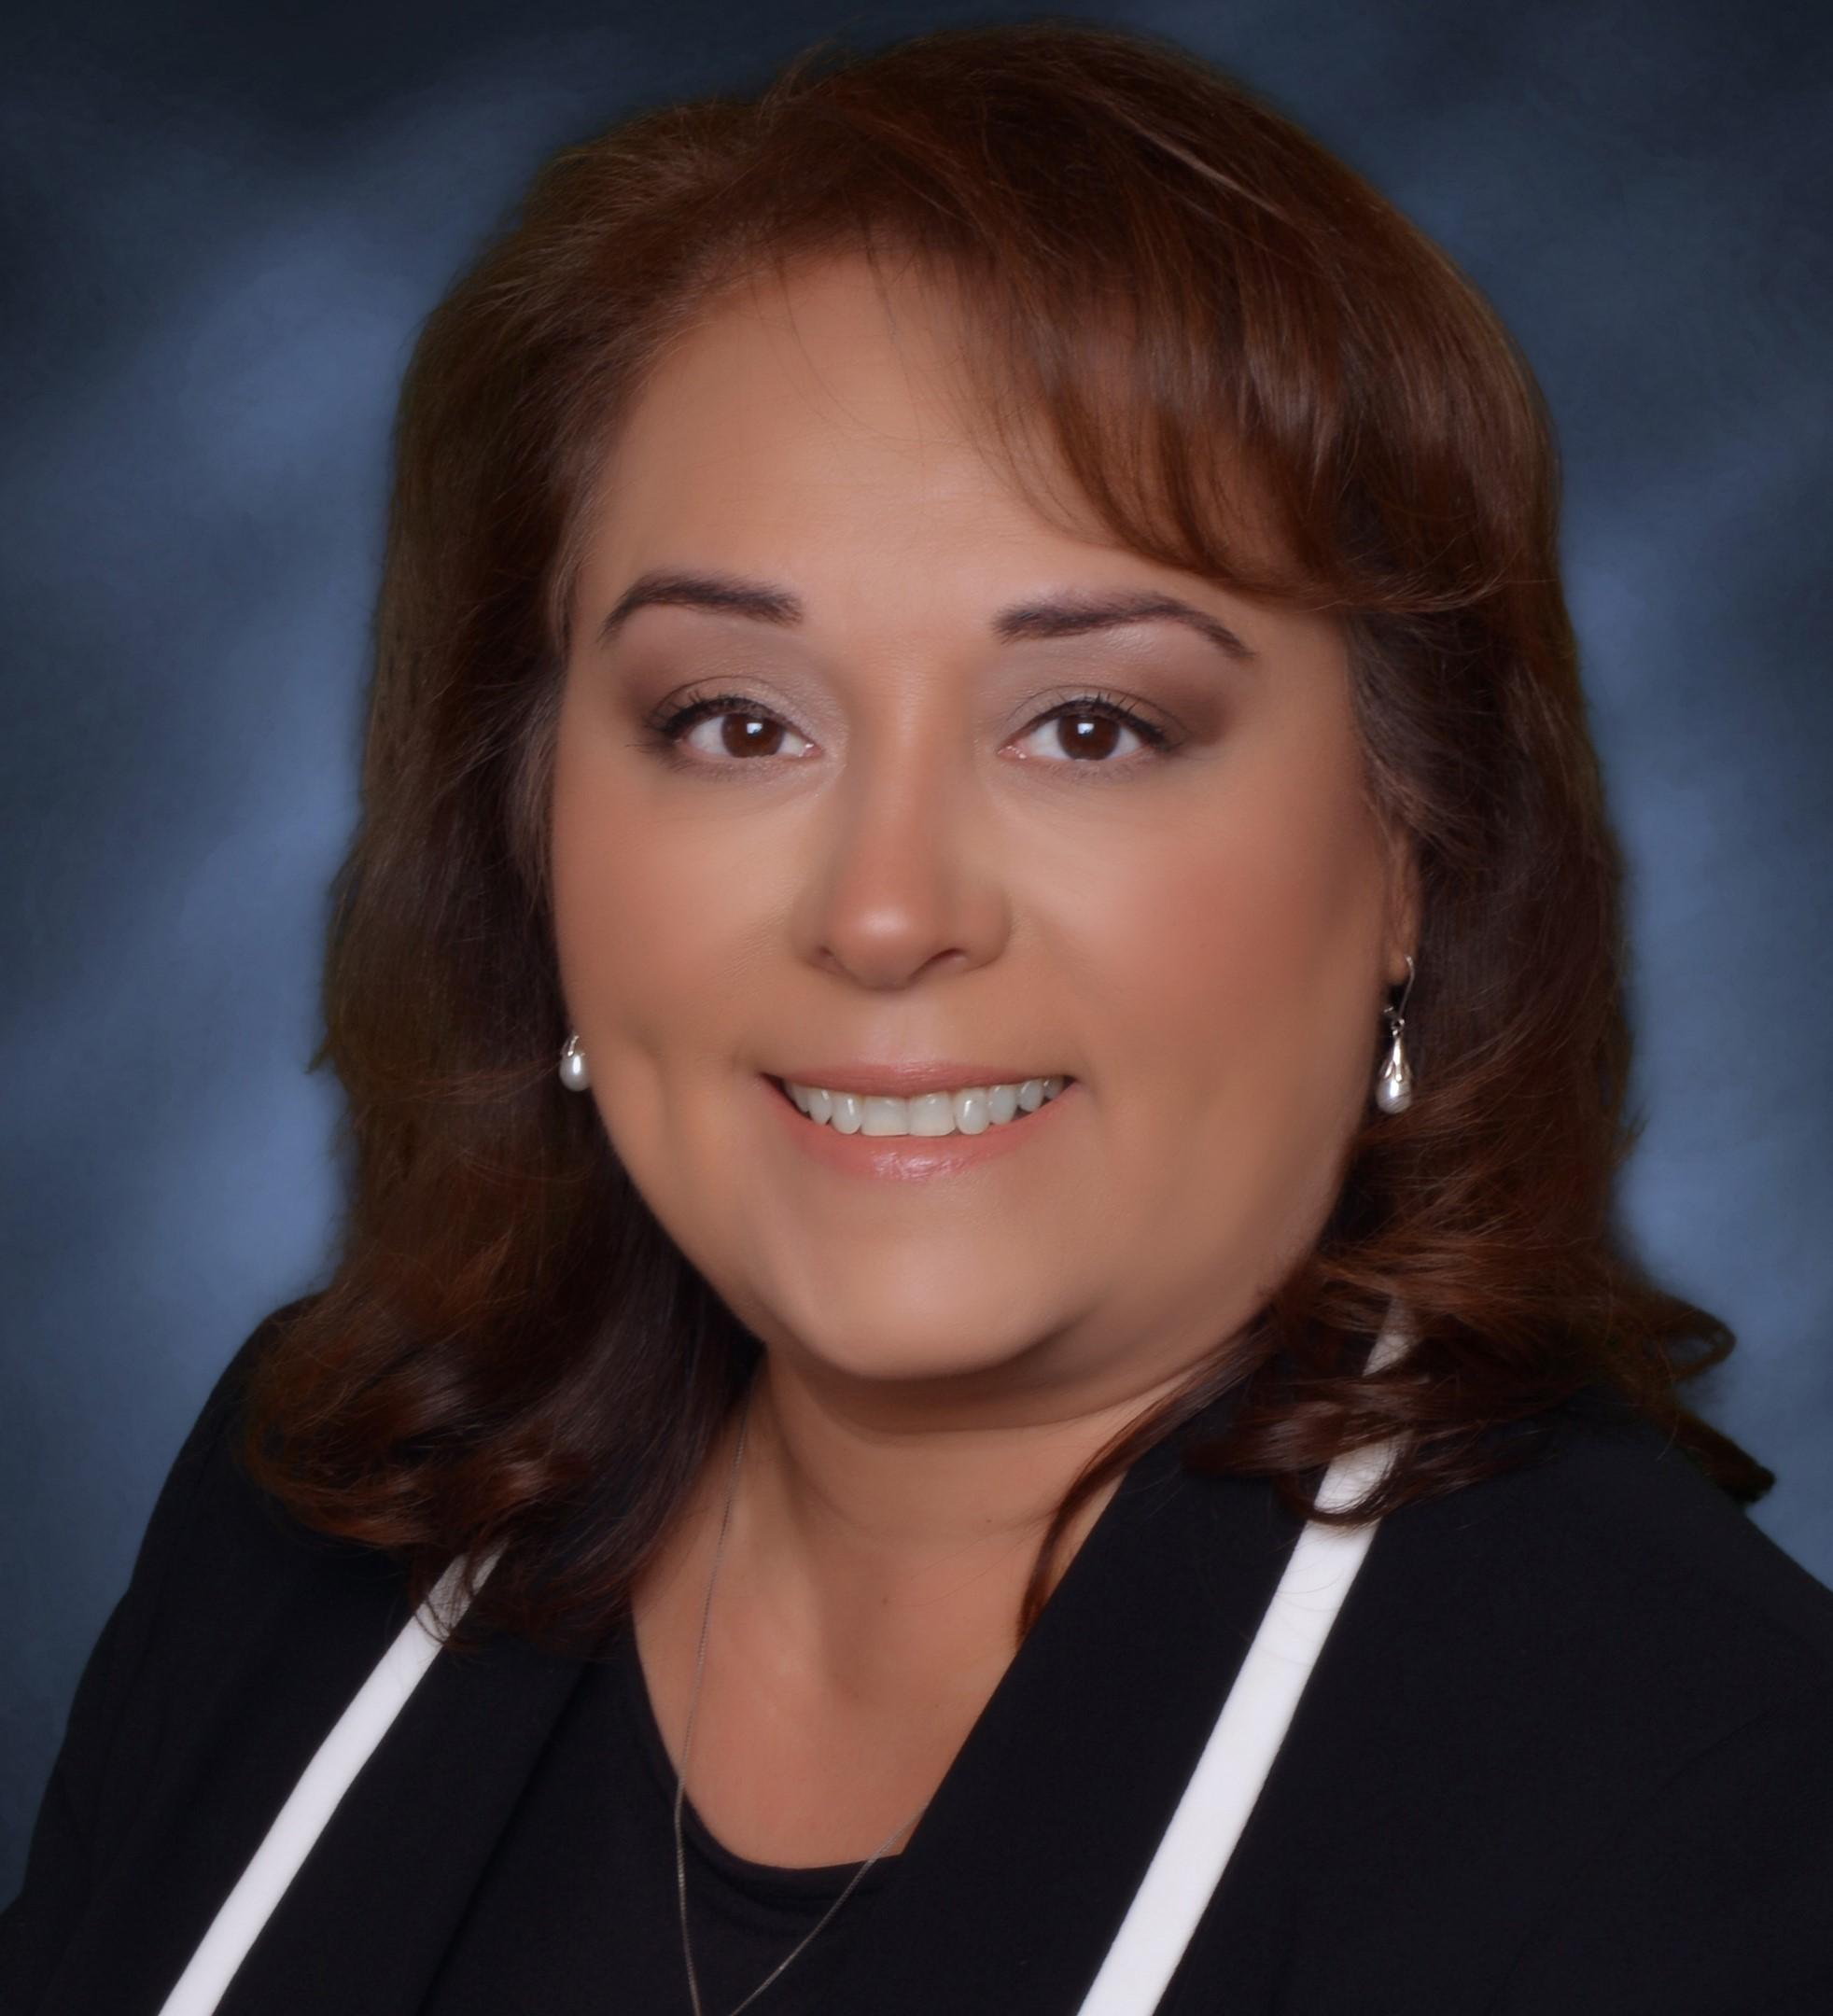 IRENE RUBIO Your Financial Professional & Insurance Agent